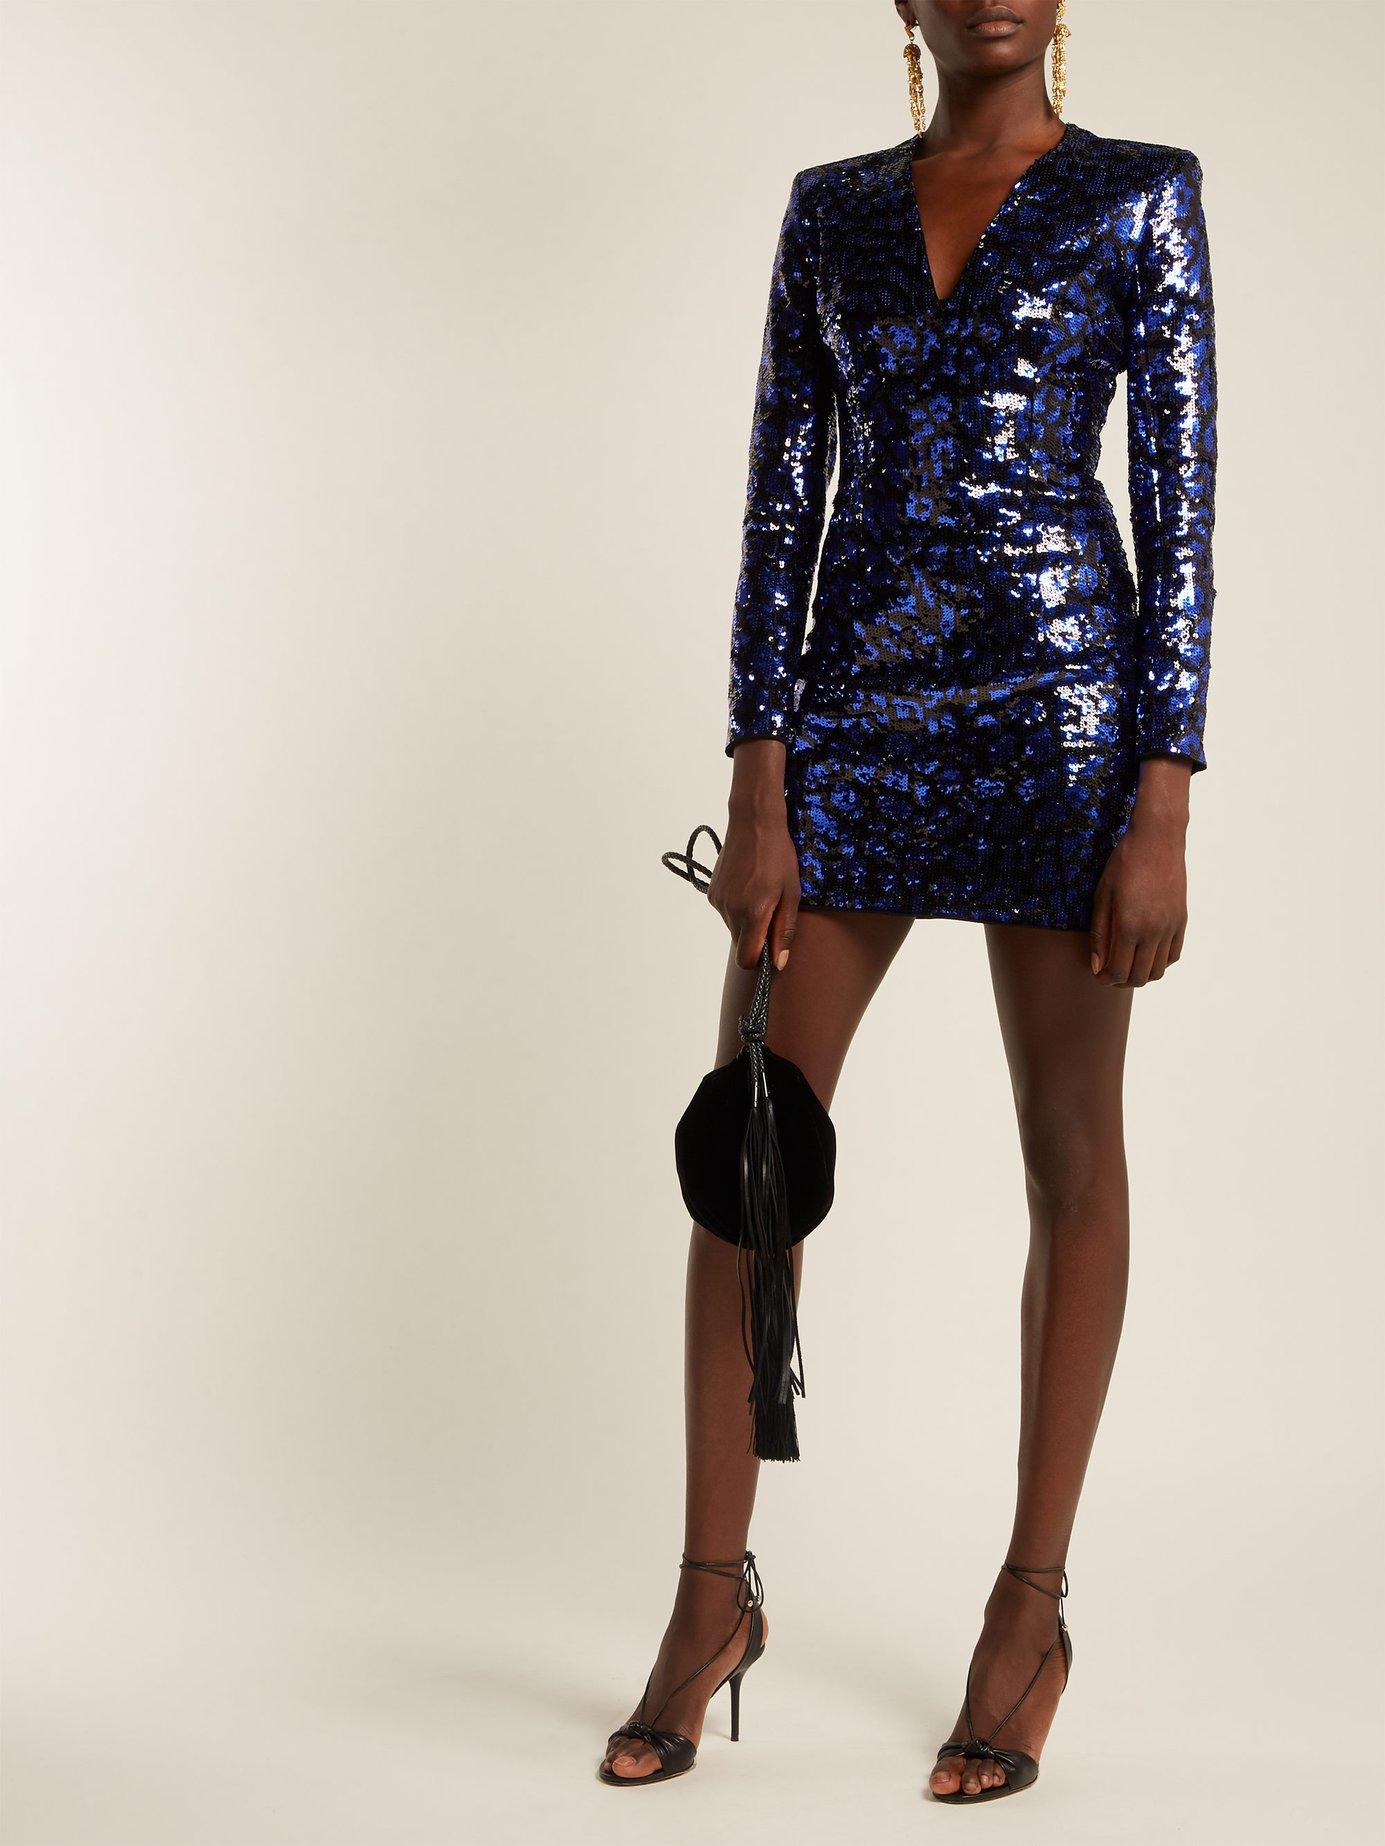 Leopard sequinned mini dress by Balmain